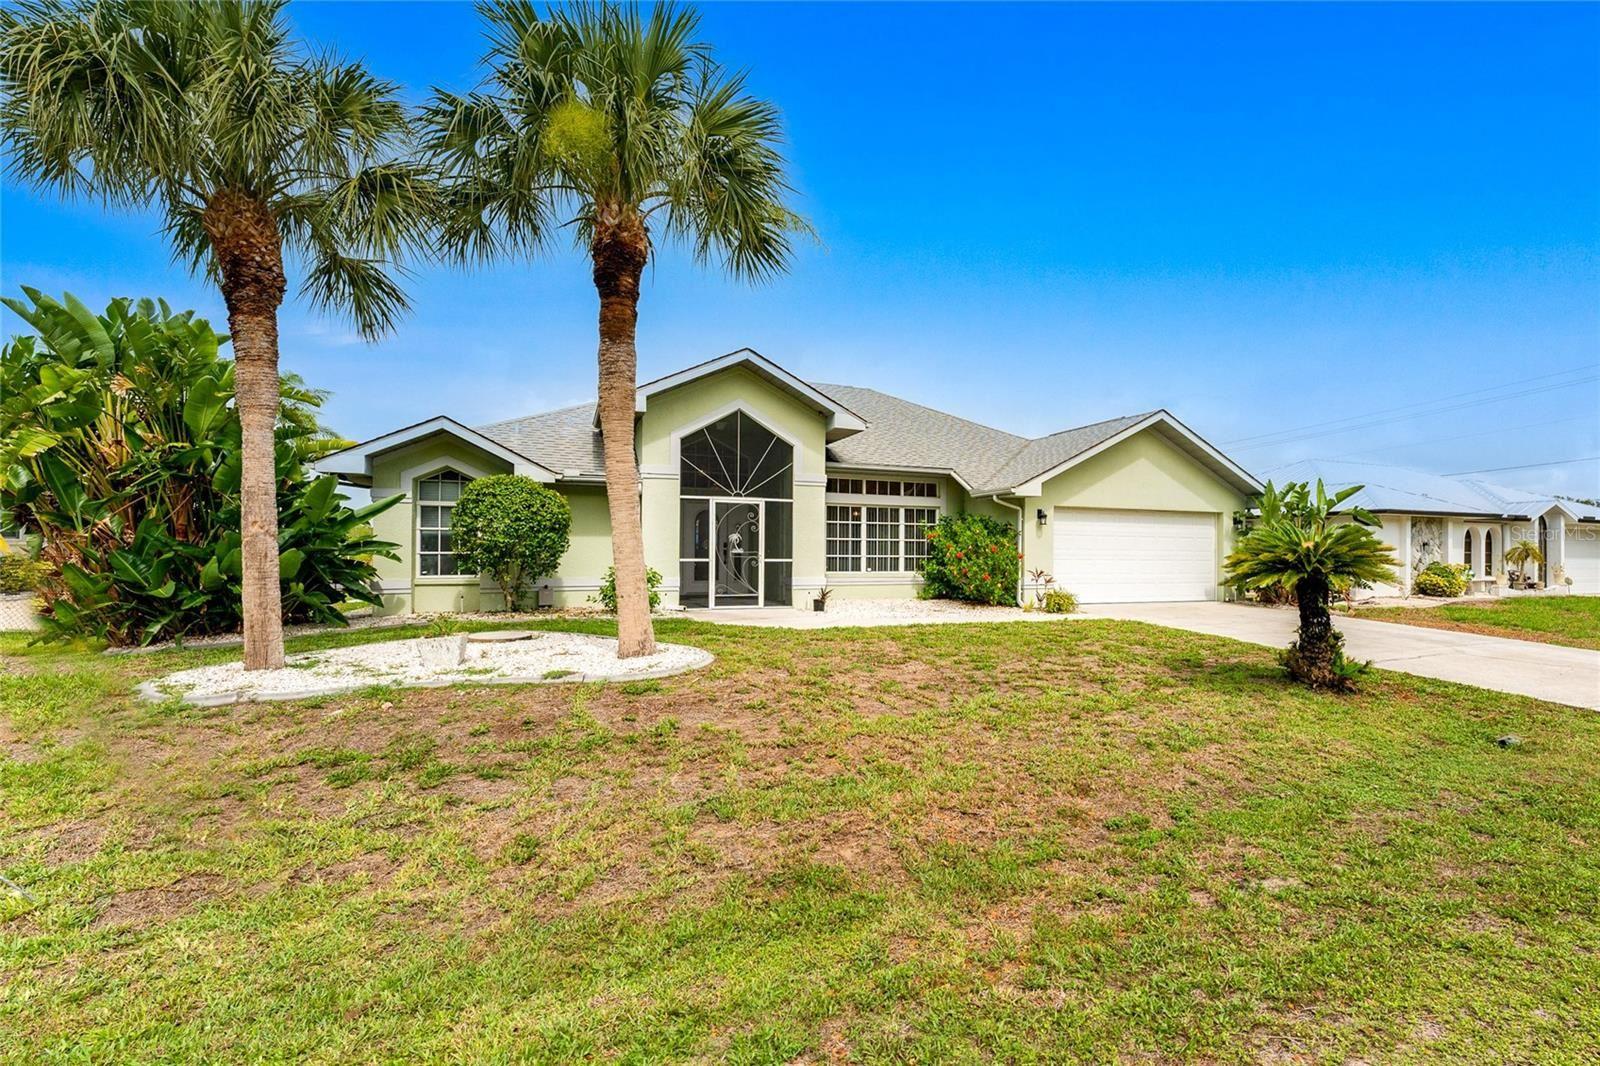 17285 ROBINSON AVE, Port Charlotte, FL 33948 - #: D6119528